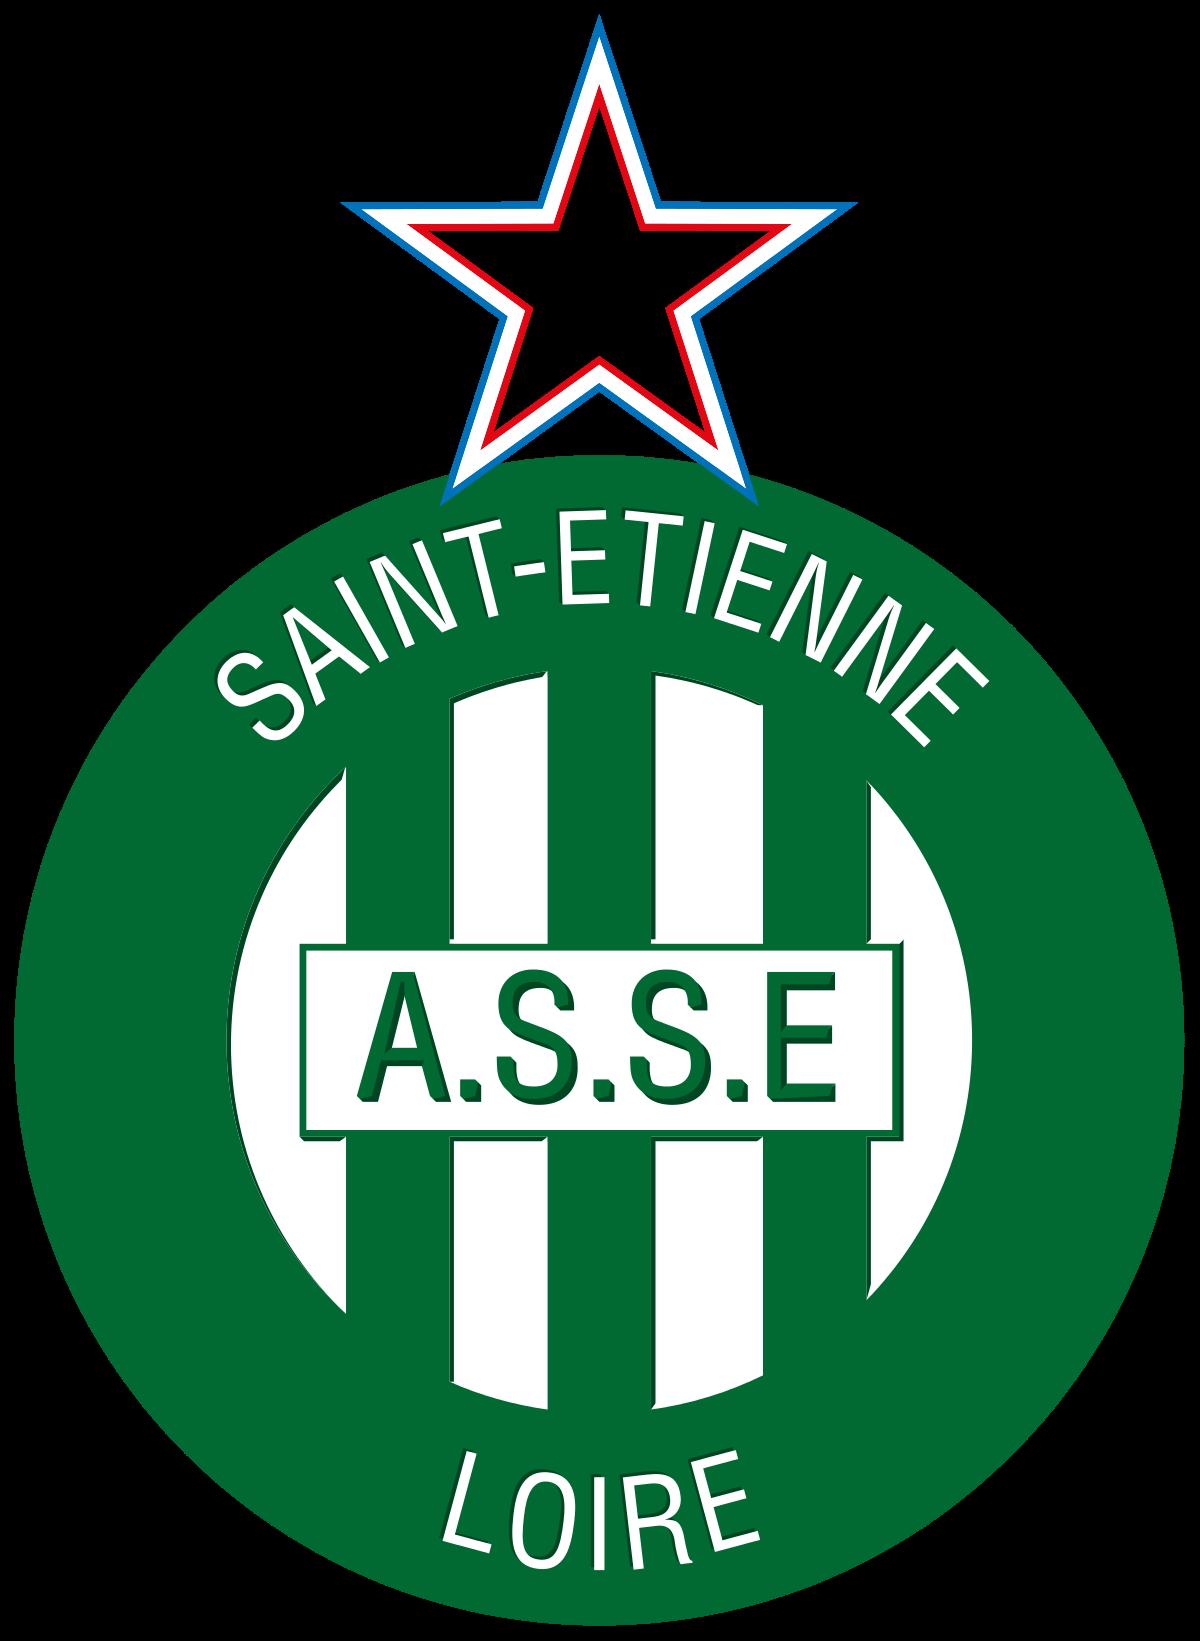 Saint Etienne Logo Ligue 1 France Saint Etienne Football Logo Soccer Logo